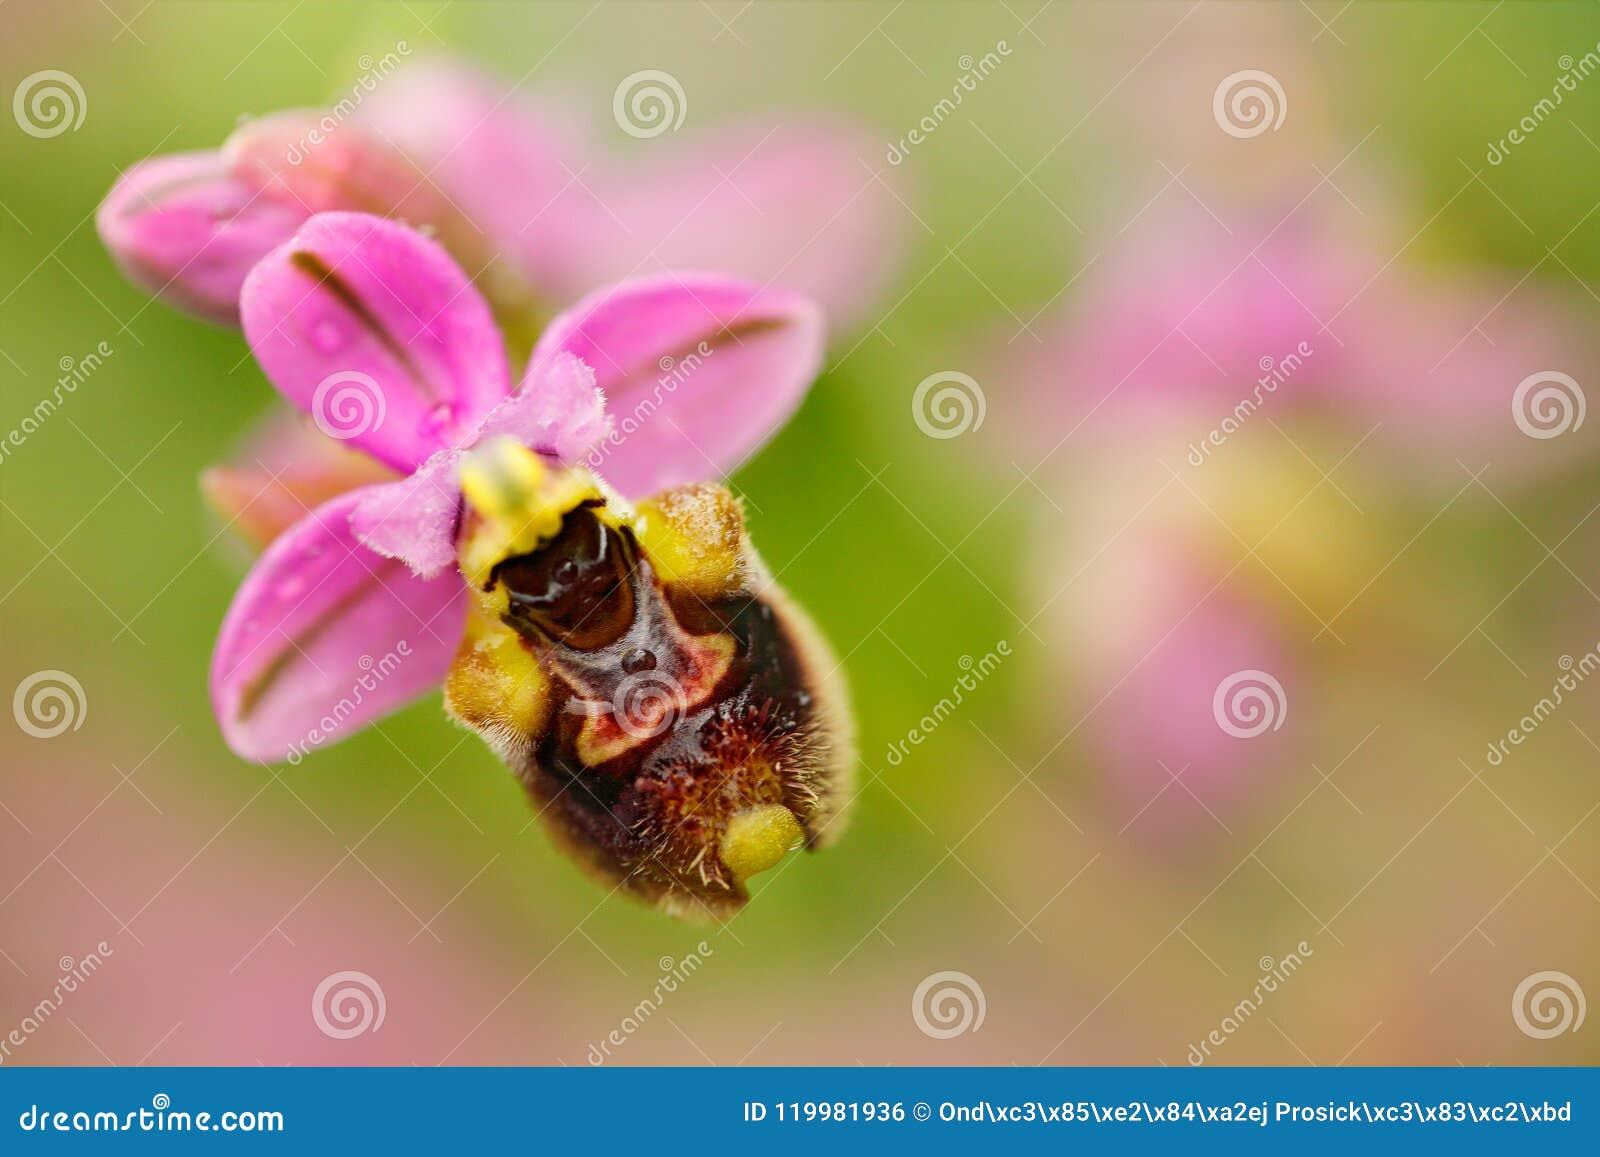 Ophrys tenthredinifera,锯蝇兰花, Gargano在意大利 开花的欧洲地球野生兰花,自然栖所 美好的det